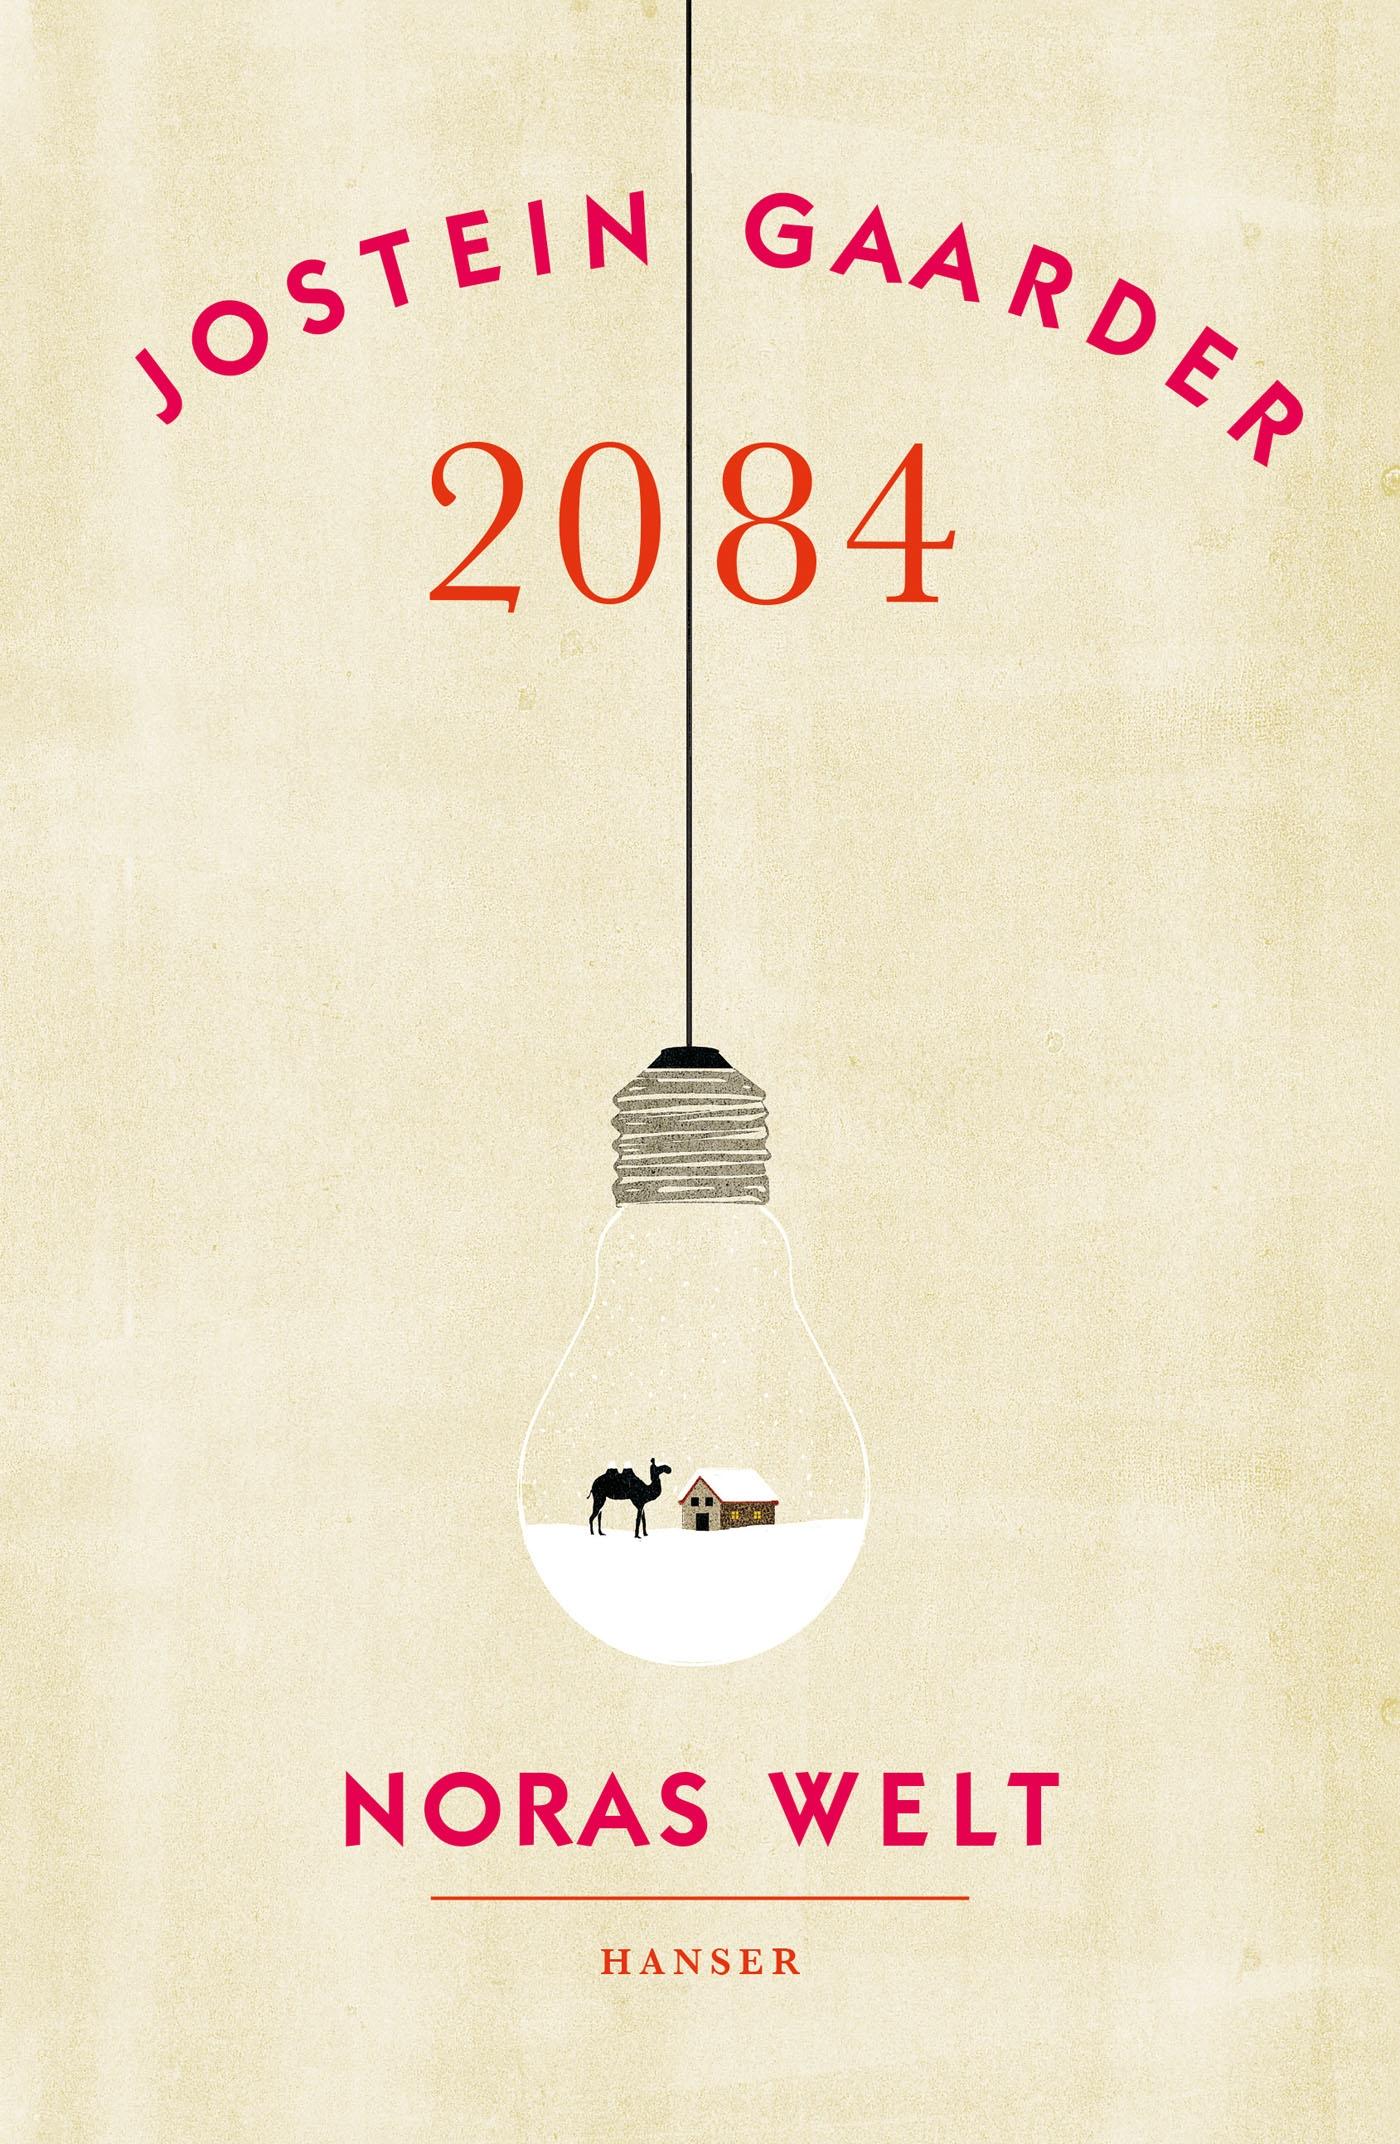 2084 - Noras Welt